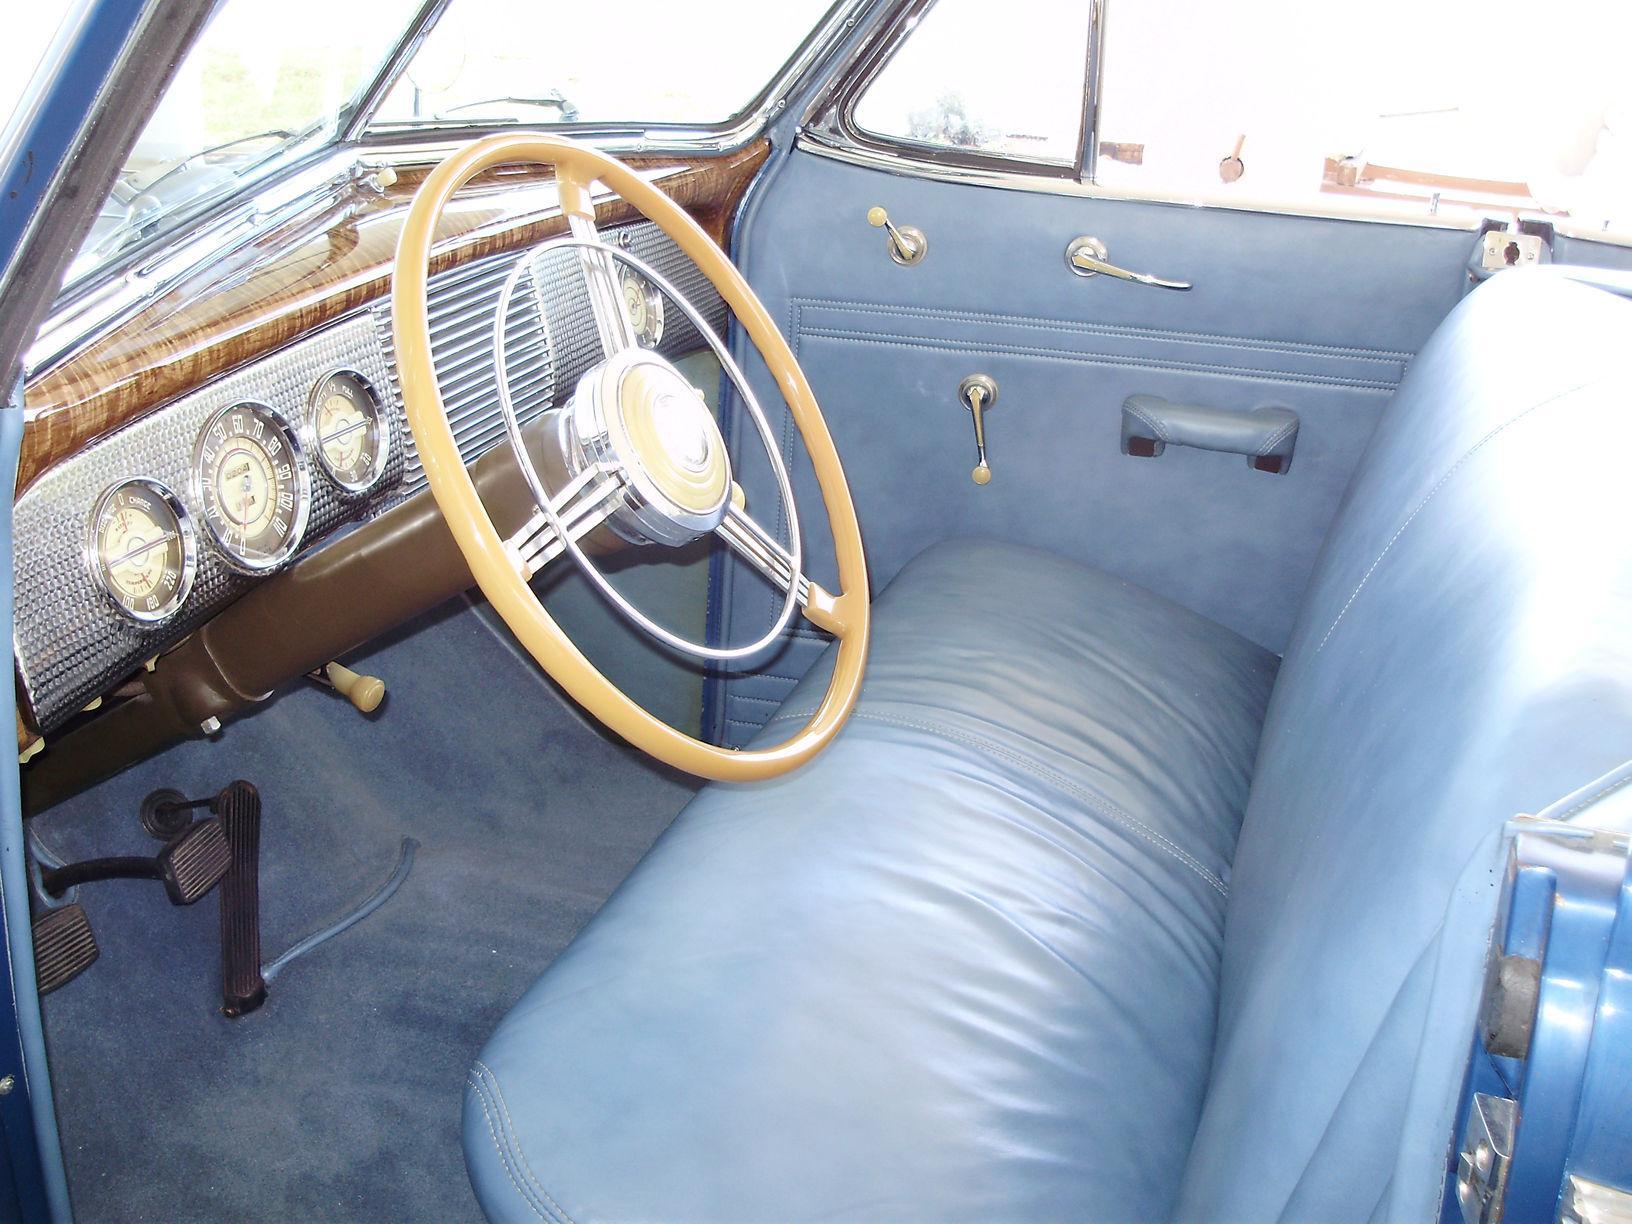 1940 BUICK CENTURY CONVERTIBLE SEDAN - Vintage Motors of Sarasota Inc. #25